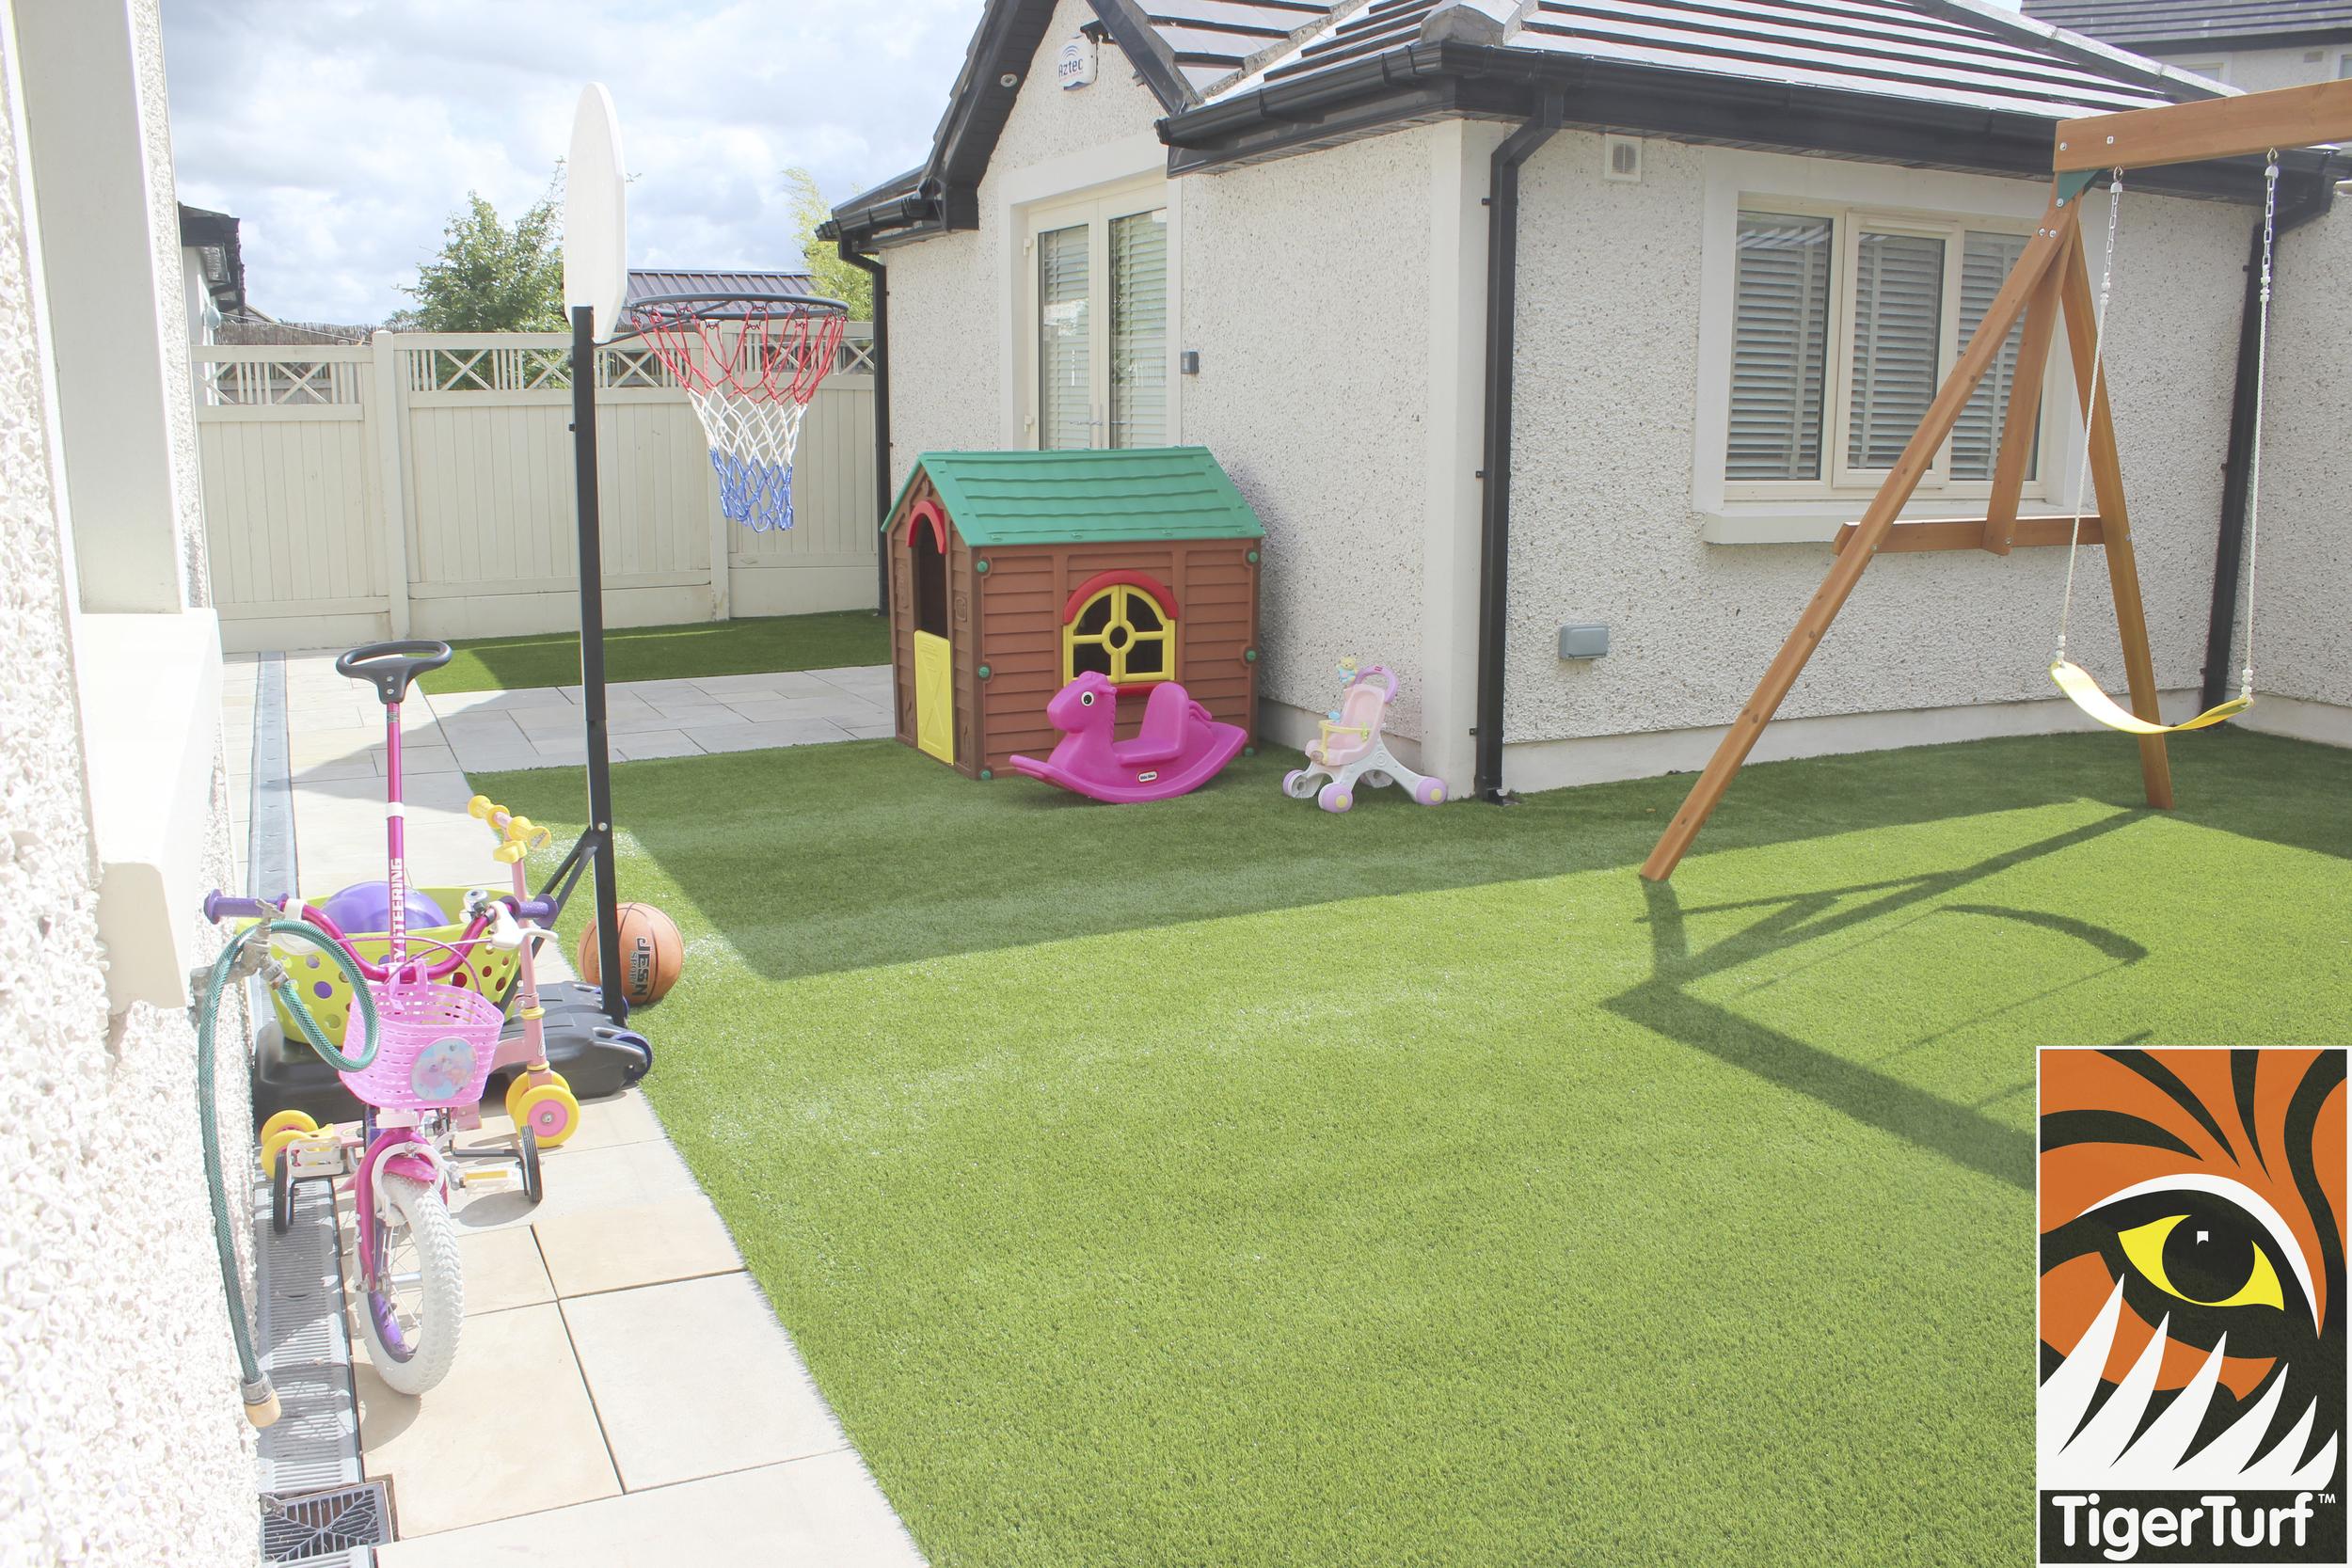 Tigerturf Finesse lawn installation